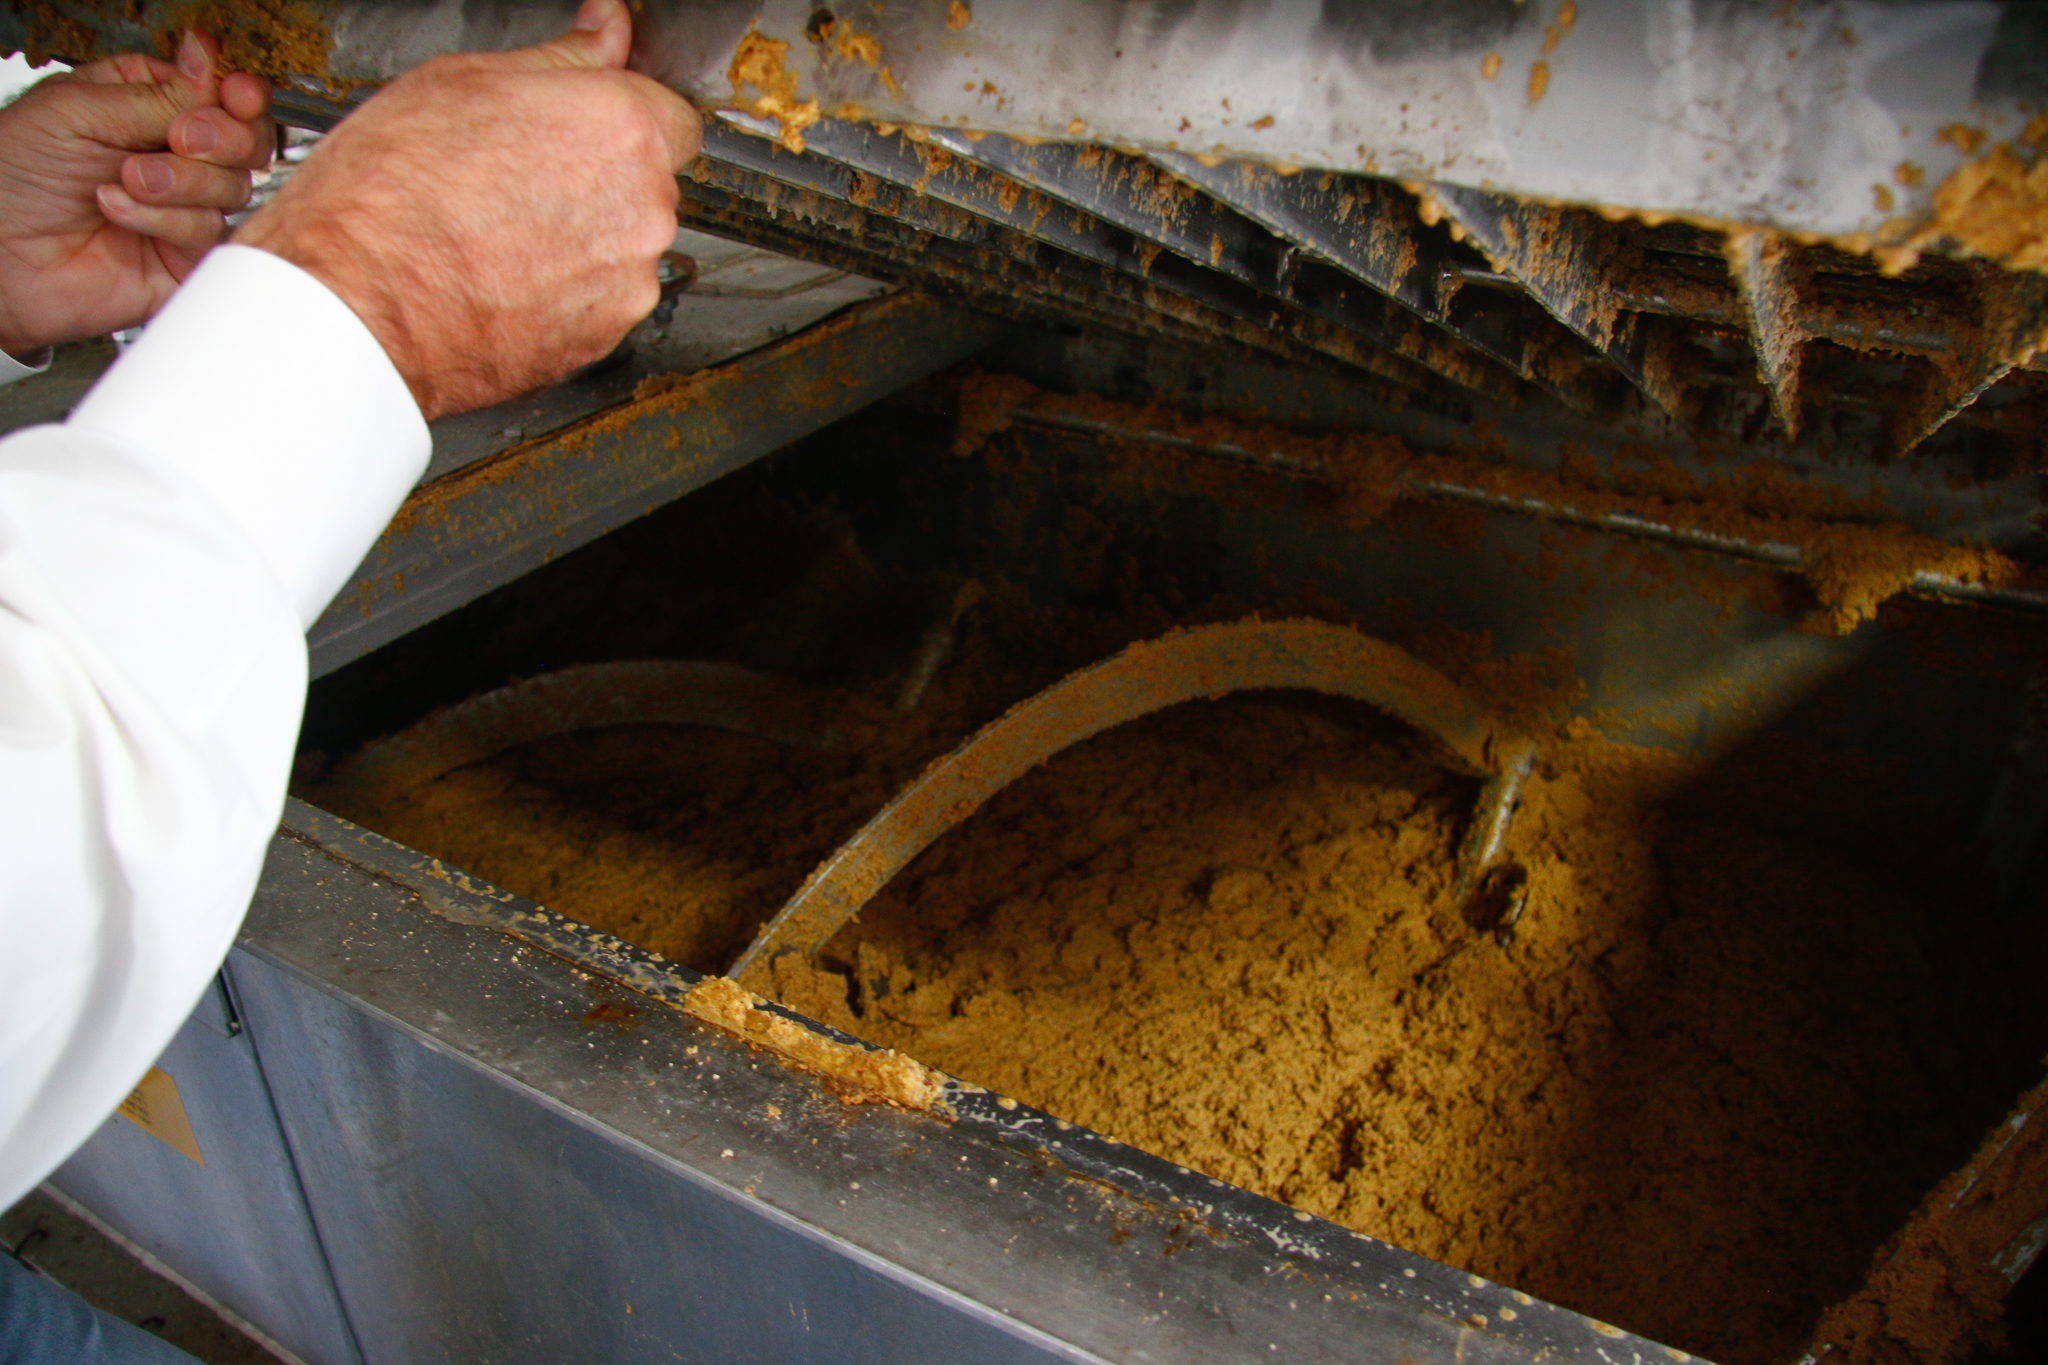 Glen Courtright peers inside the factory's porridge mixer.